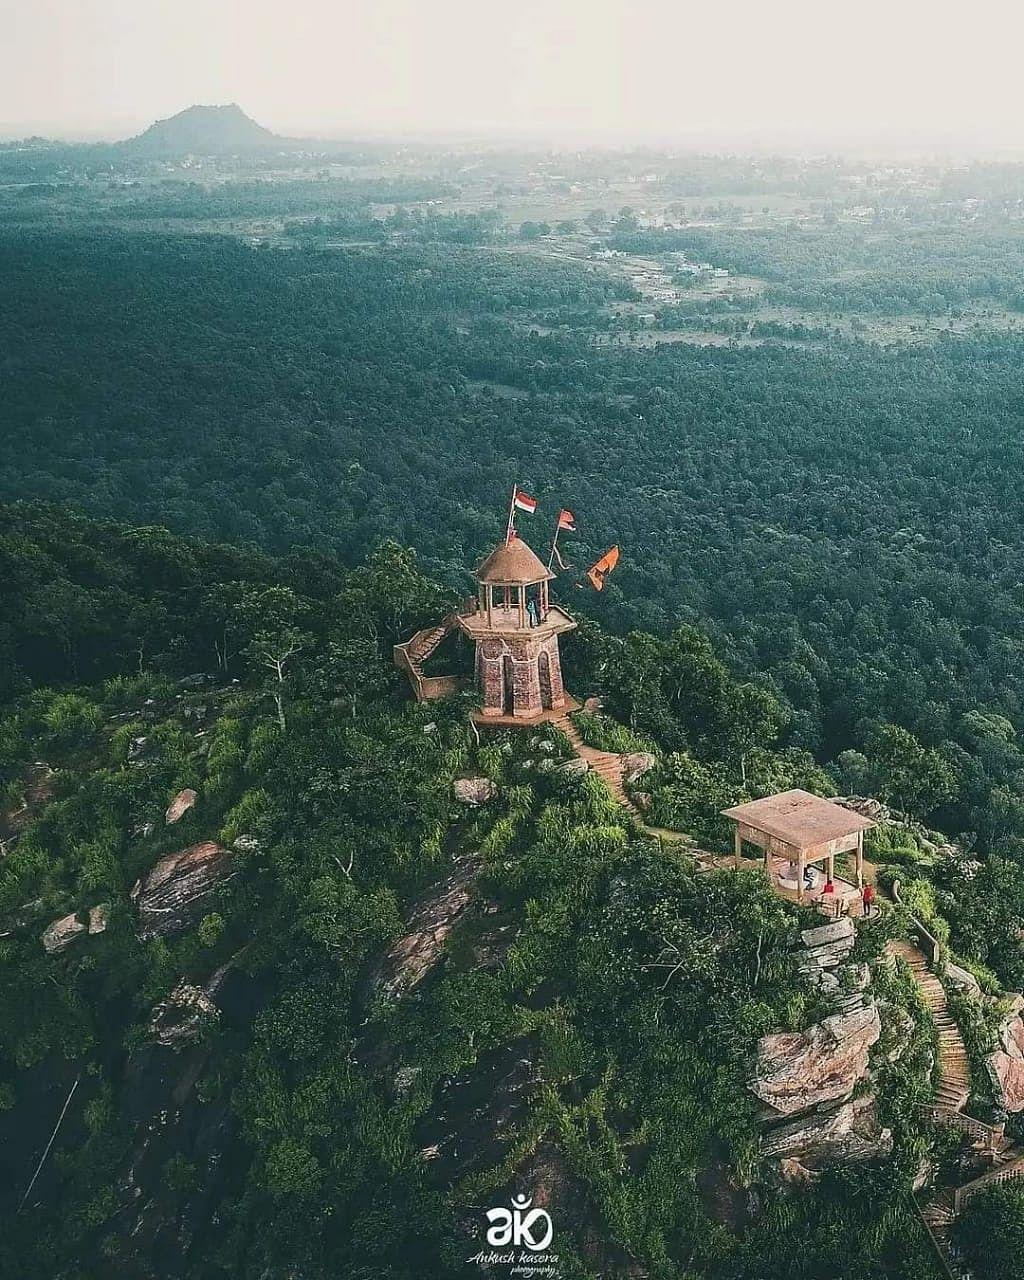 Tourist Places In Jharkhand : पर्यटकों का मन मोहते ये पर्यटन स्थल